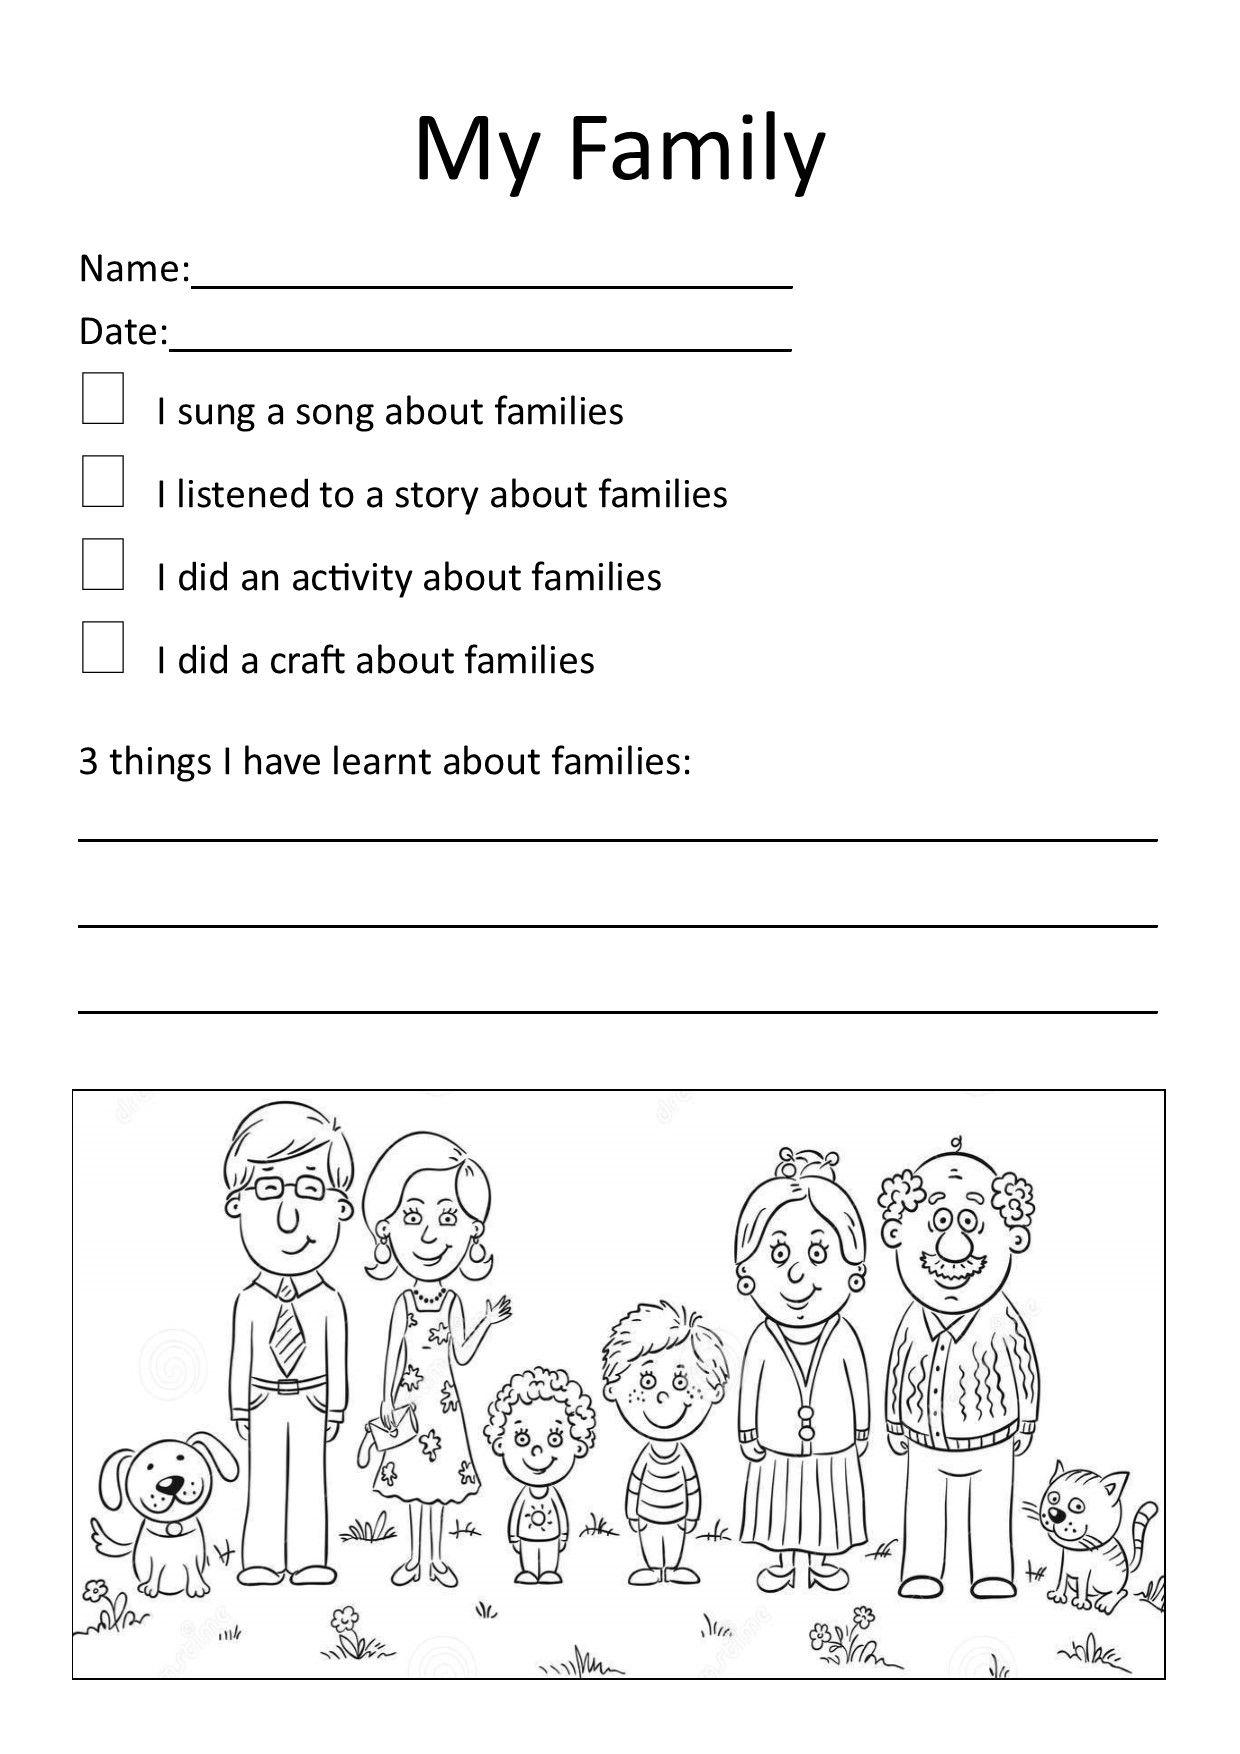 My Family Worksheet My family worksheet, Family